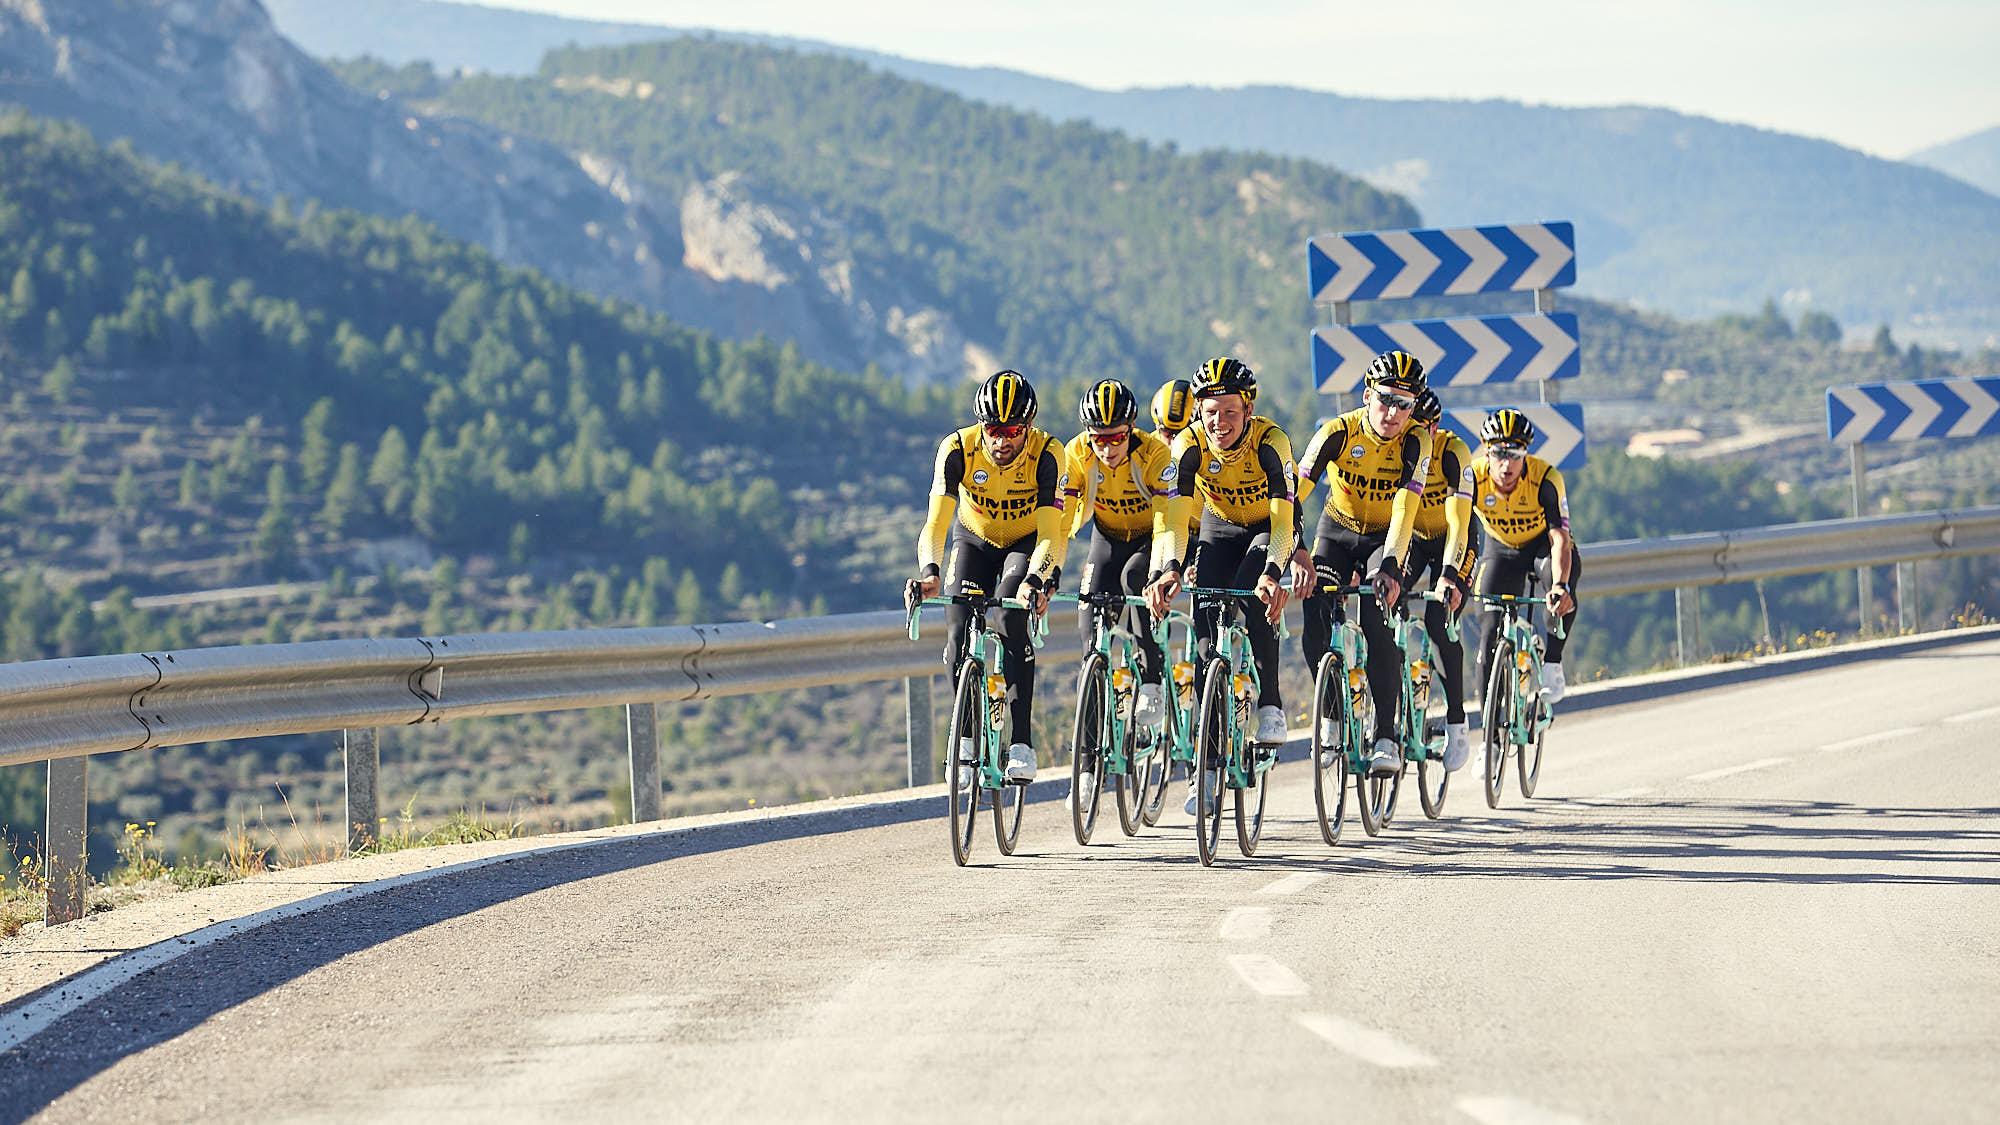 Group of Jumbo-Visma cyclists during training near Alicante